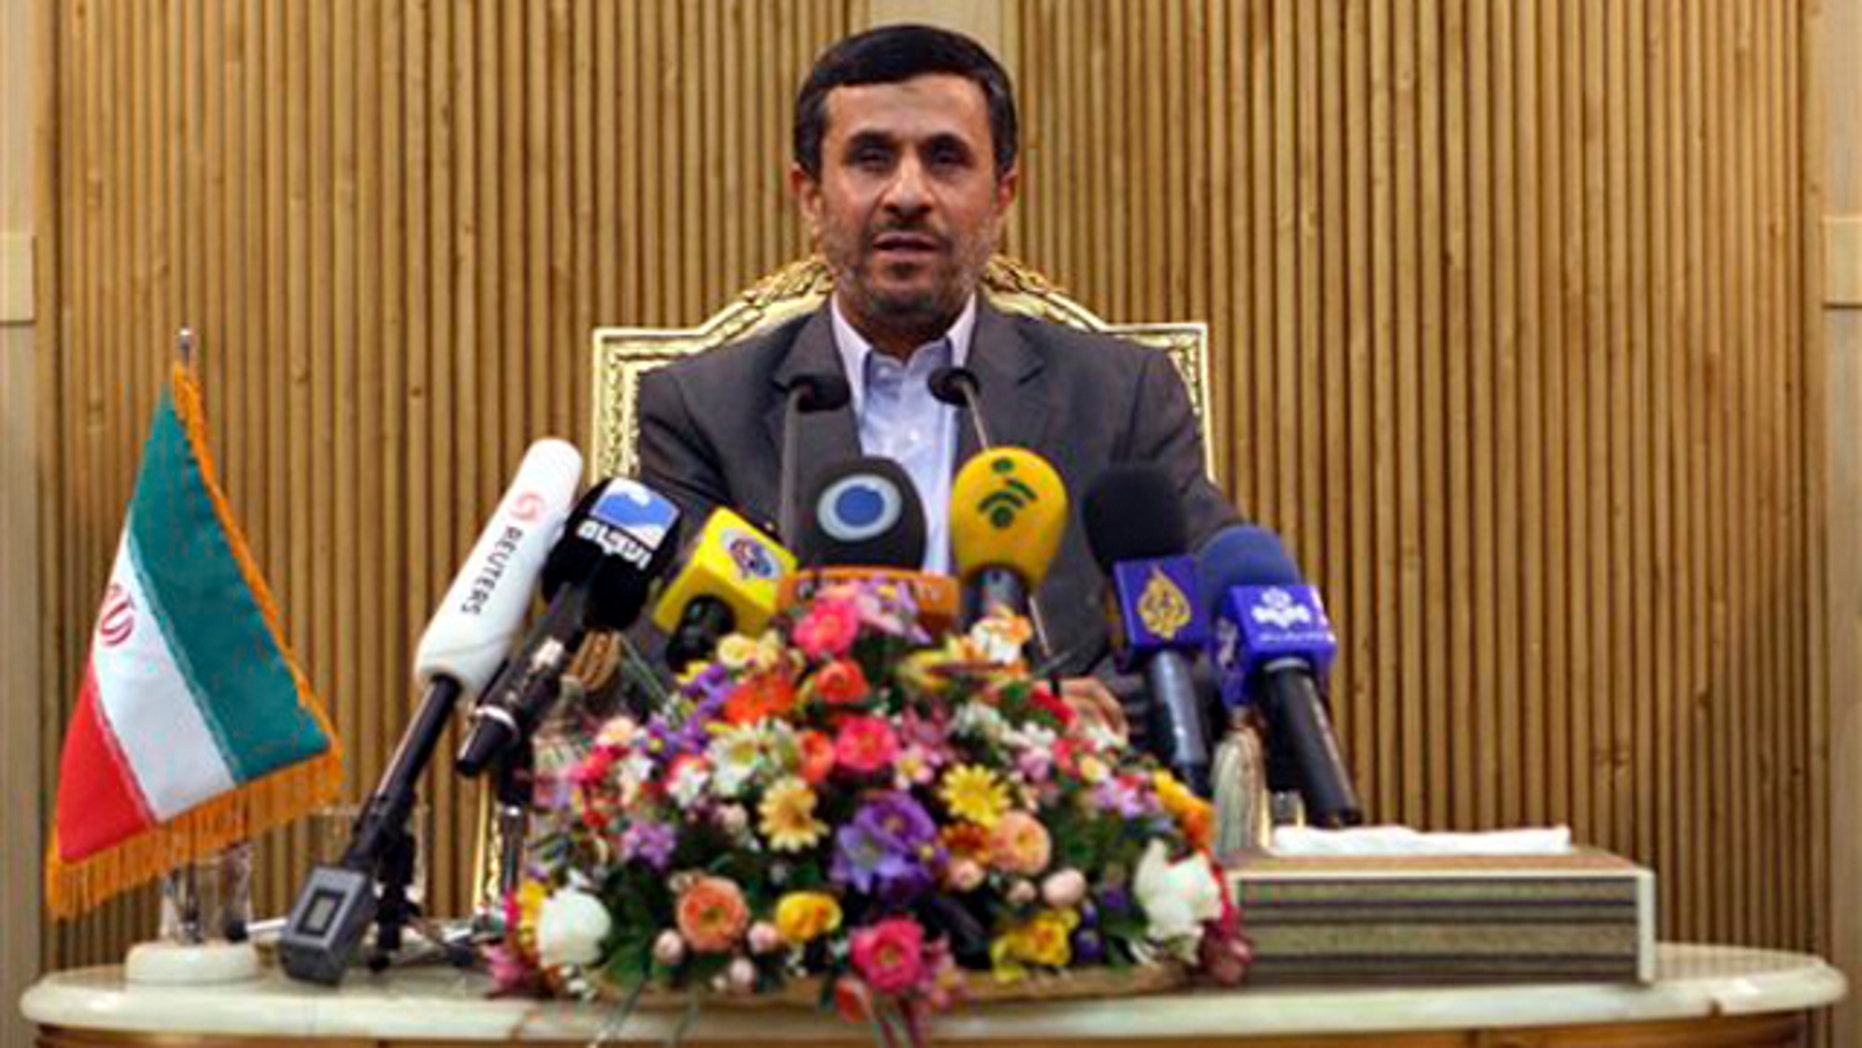 Sept. 4: Iranian President Mahmoud Ahmadinejad briefs the media, prior to departing Tehran's Mehrabad airport for a trip to Tajikistan.